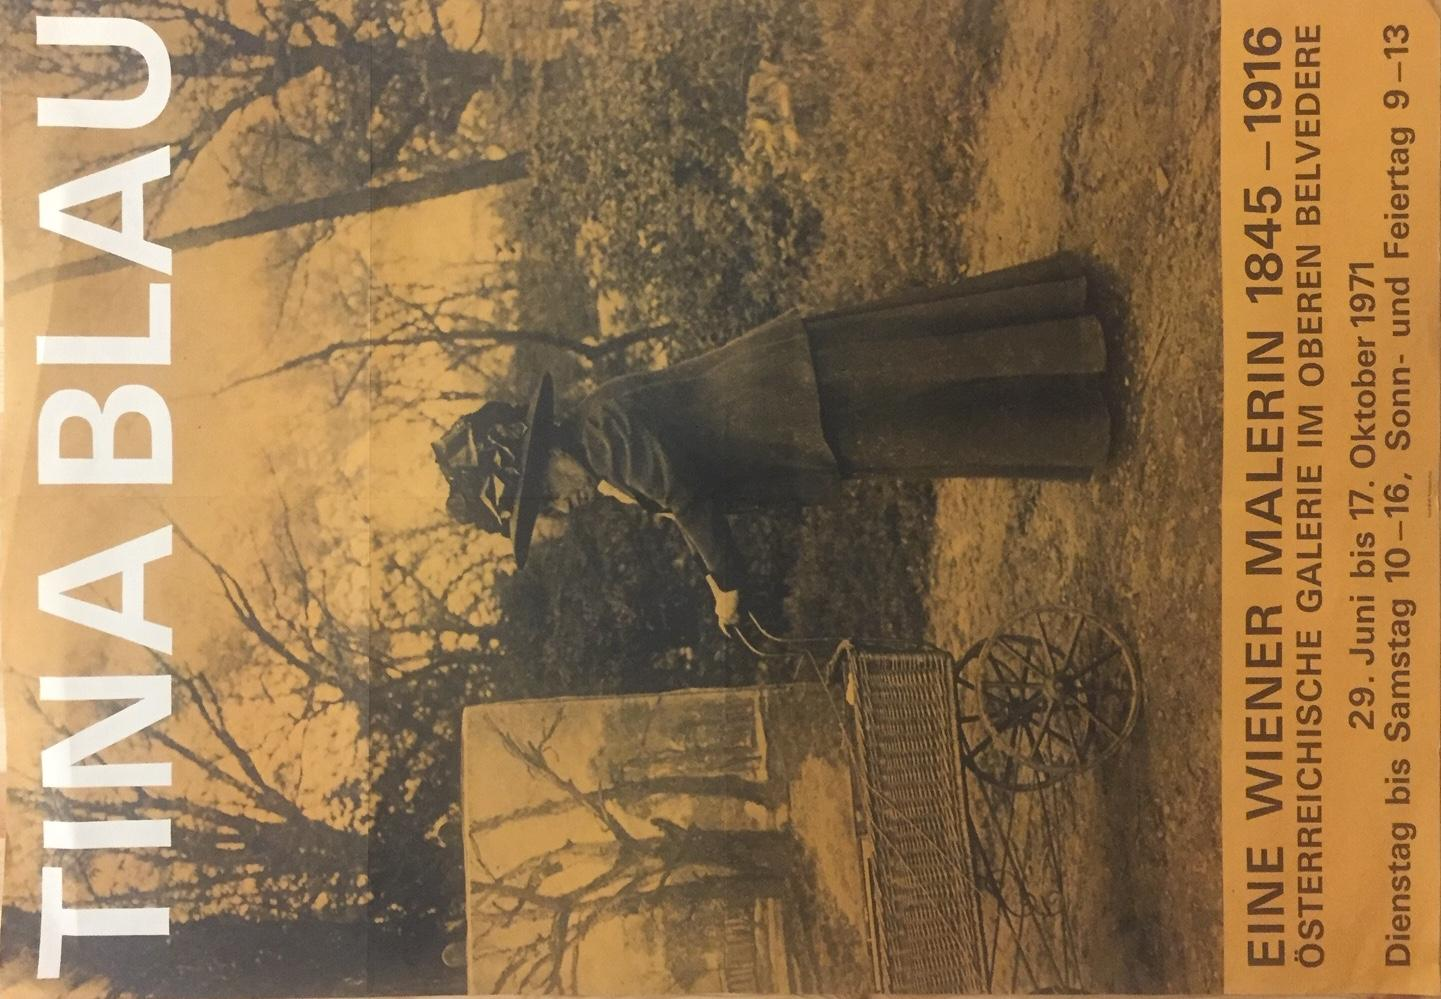 Tina Blau - Eine Wiener Malerin 1845 - 1916 - BLAU, TINA